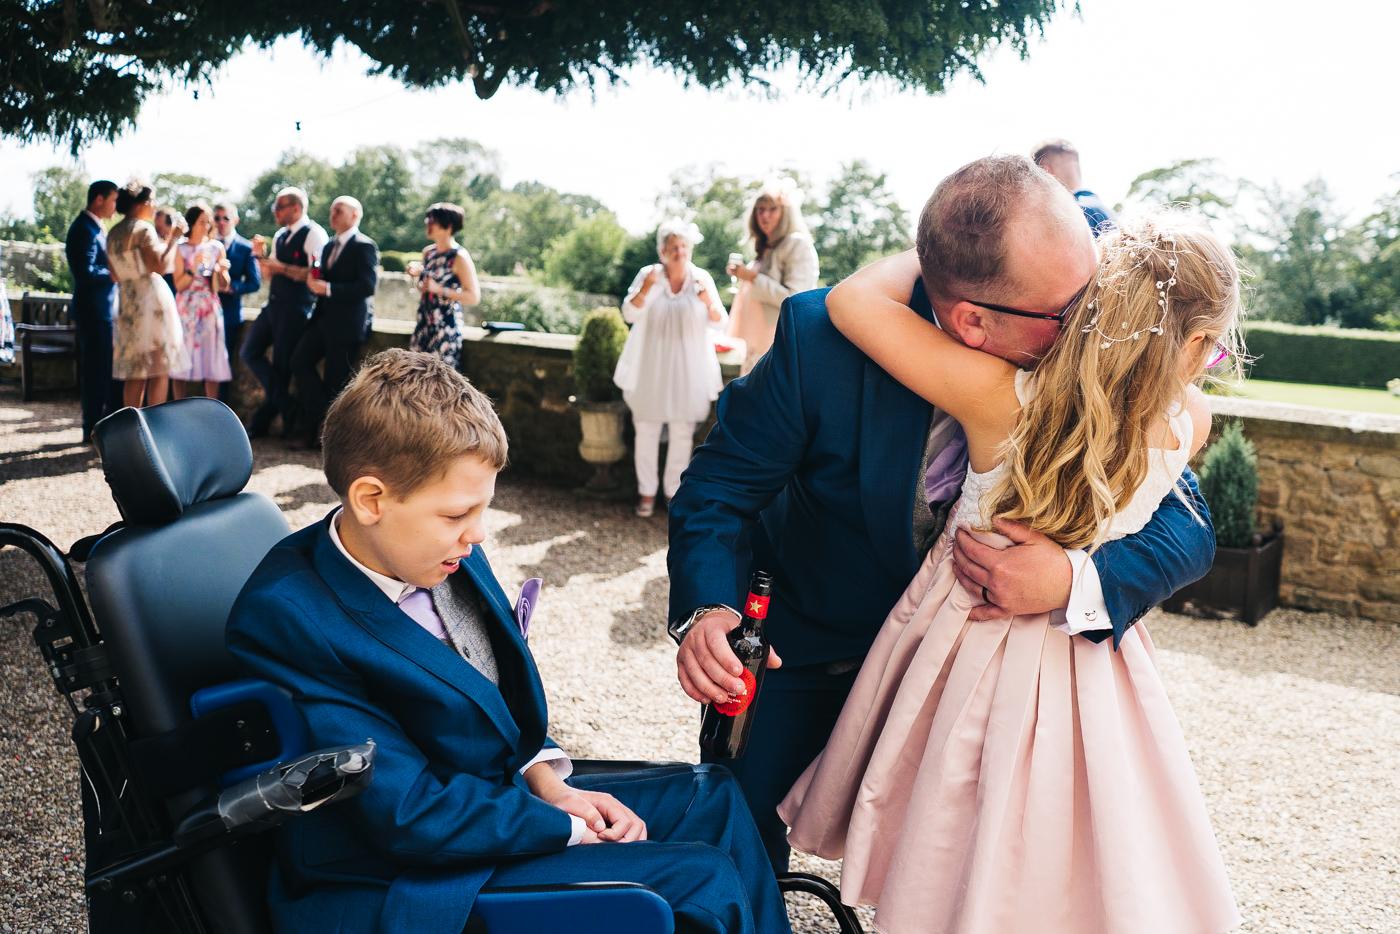 headlame-hall-north-yorkshire-north-east-photographer-wedding-0027.jpg